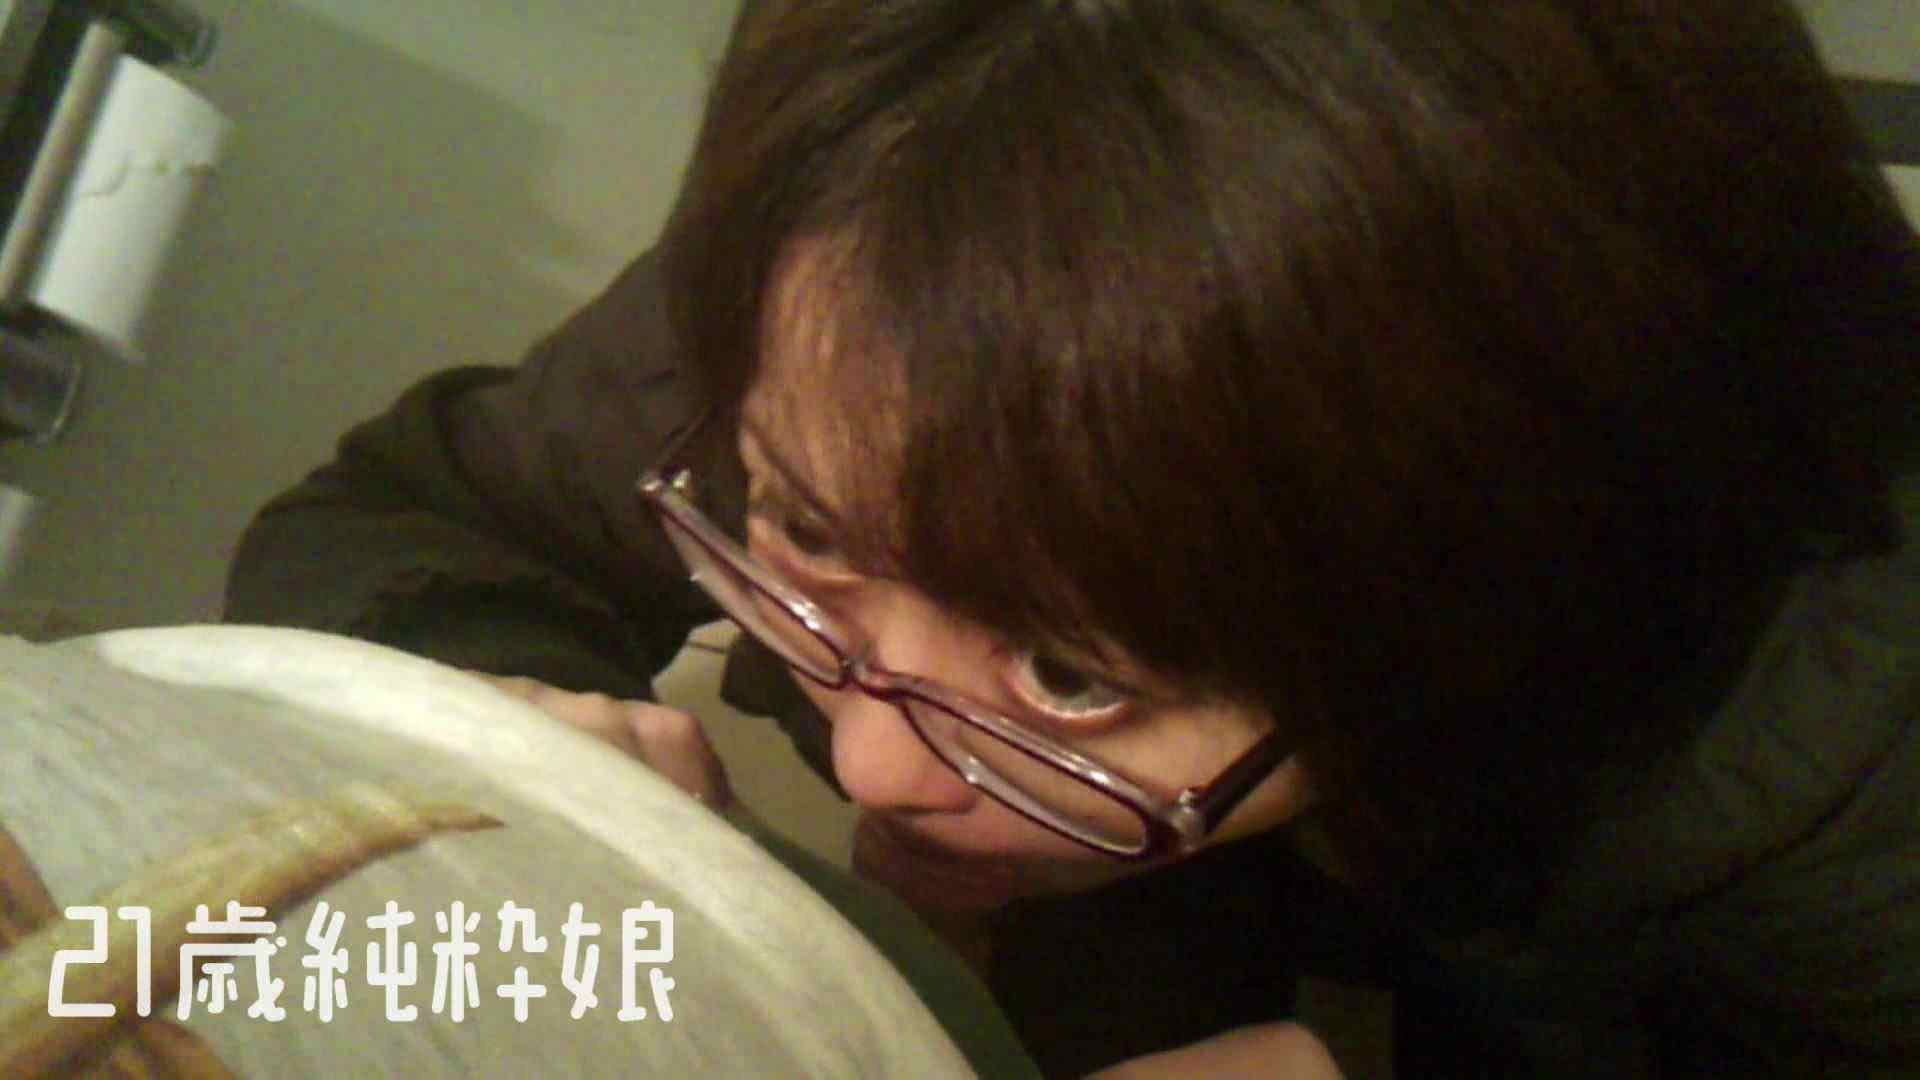 Gカップ21歳純粋嬢第2弾Vol.5 OLのエロ生活 ヌード画像 108連発 38